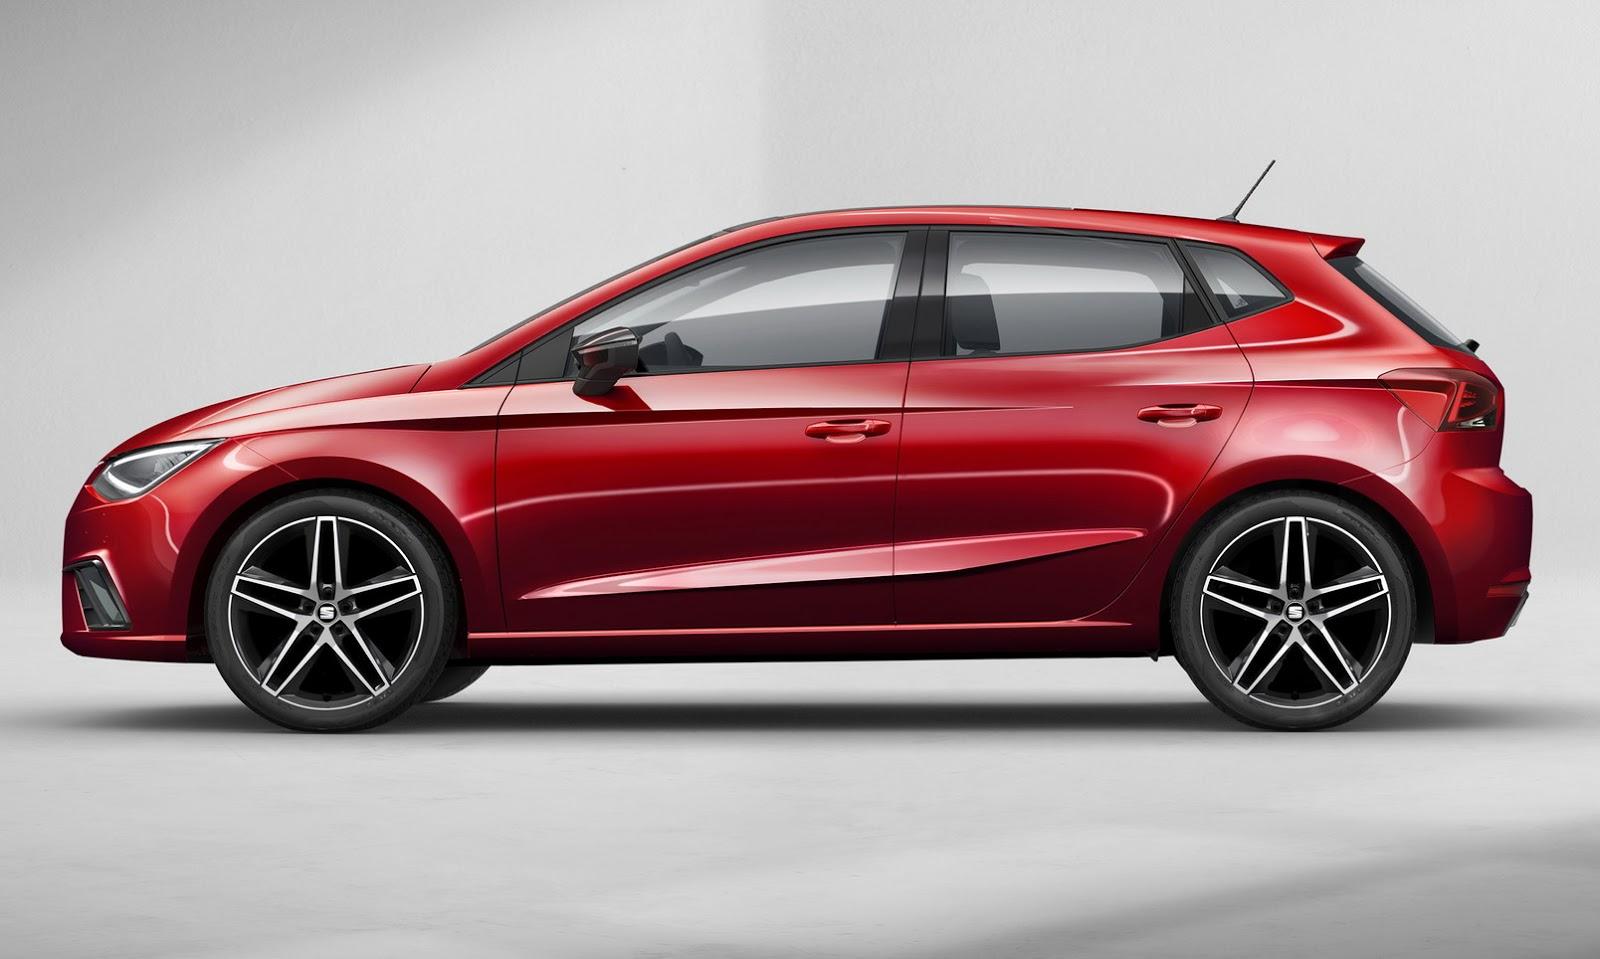 2017 Seat Ibiza Configurator Launched  Basic Non